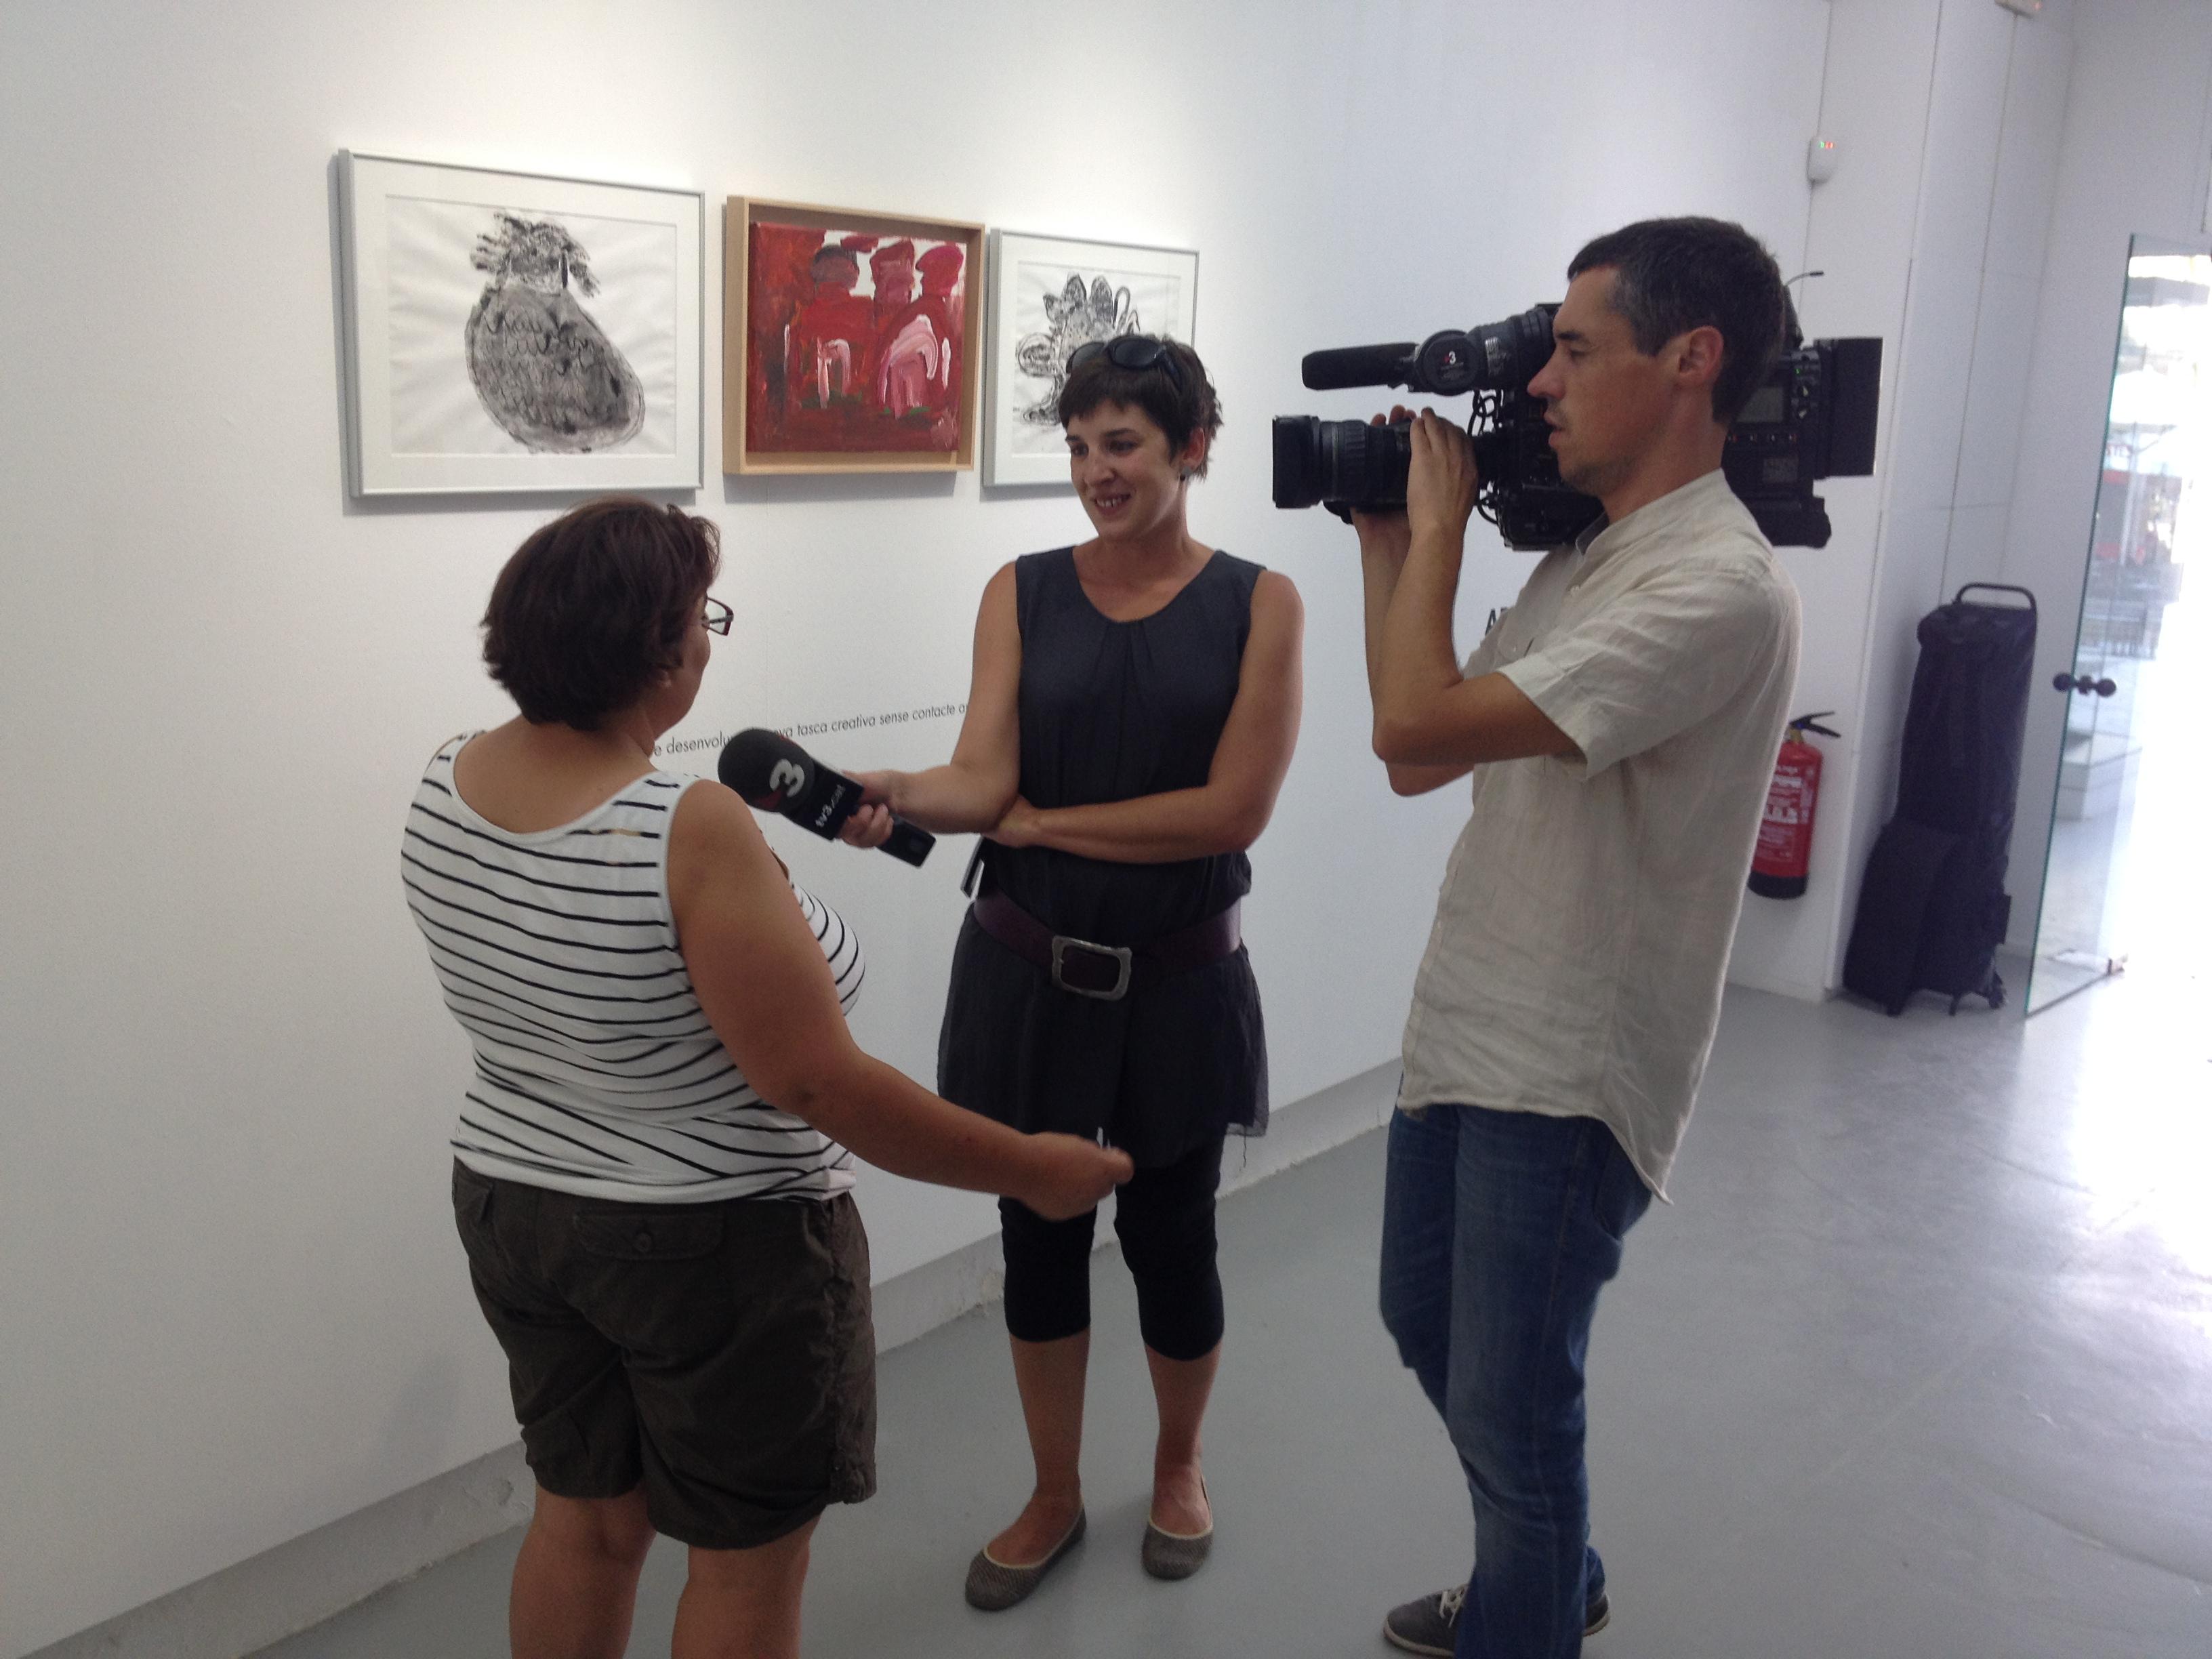 La periodista de TV3 Neus Santamaria entrevista a Sandra Planas.